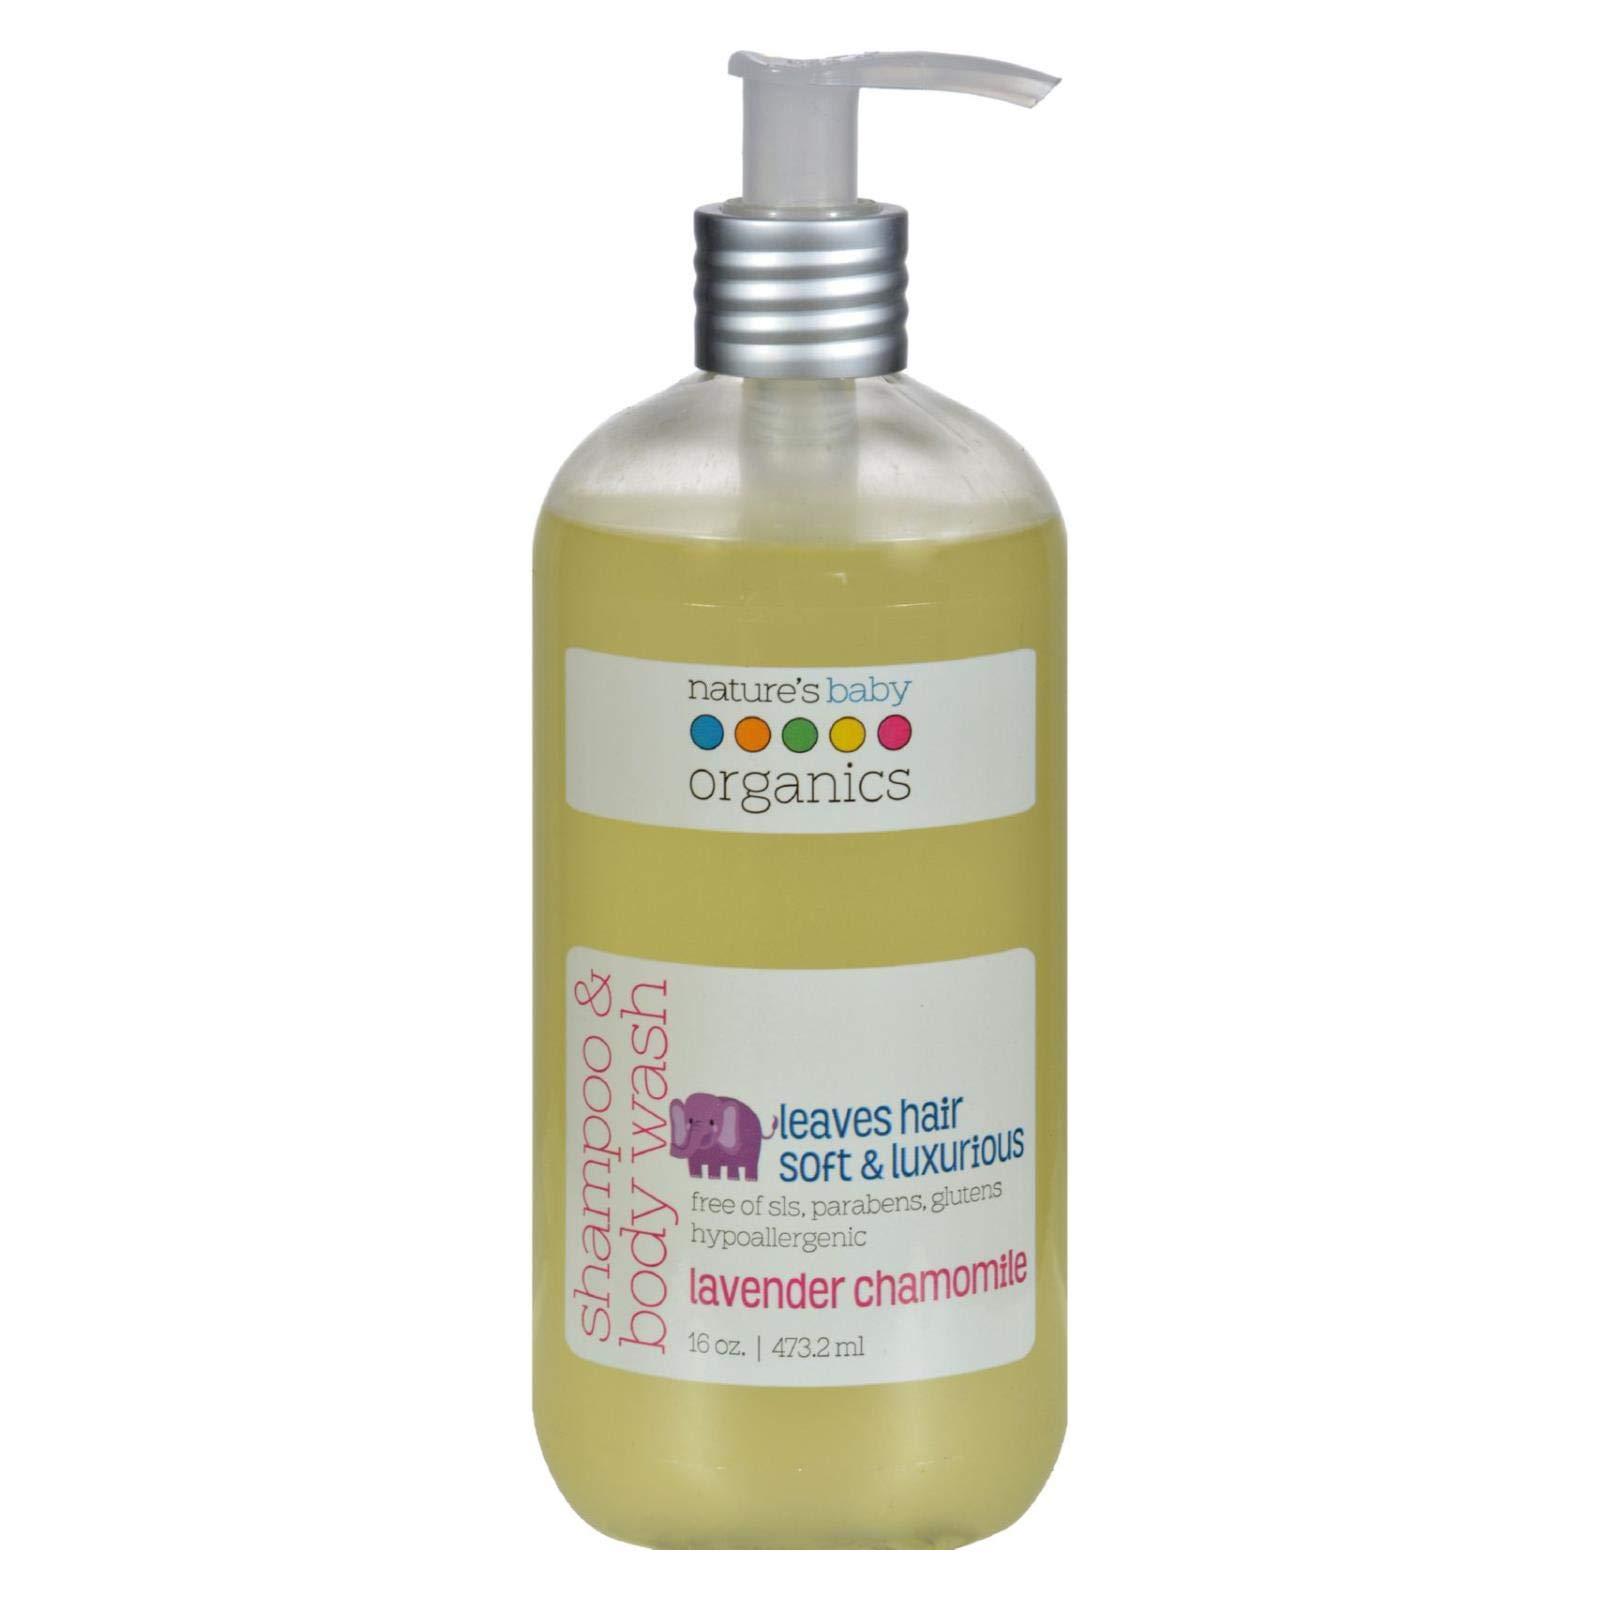 Nature's Baby Organics Shampoo & Body Wash, Vanilla Tangerine, 8 oz   Babies, Kids, & Adults! Moisturizing, Organic, Soft, Natural, Suave, Hypoallergenic   No Harsh Chemicals Or Parabens, SLS, Glutens by Nature's Baby Organics